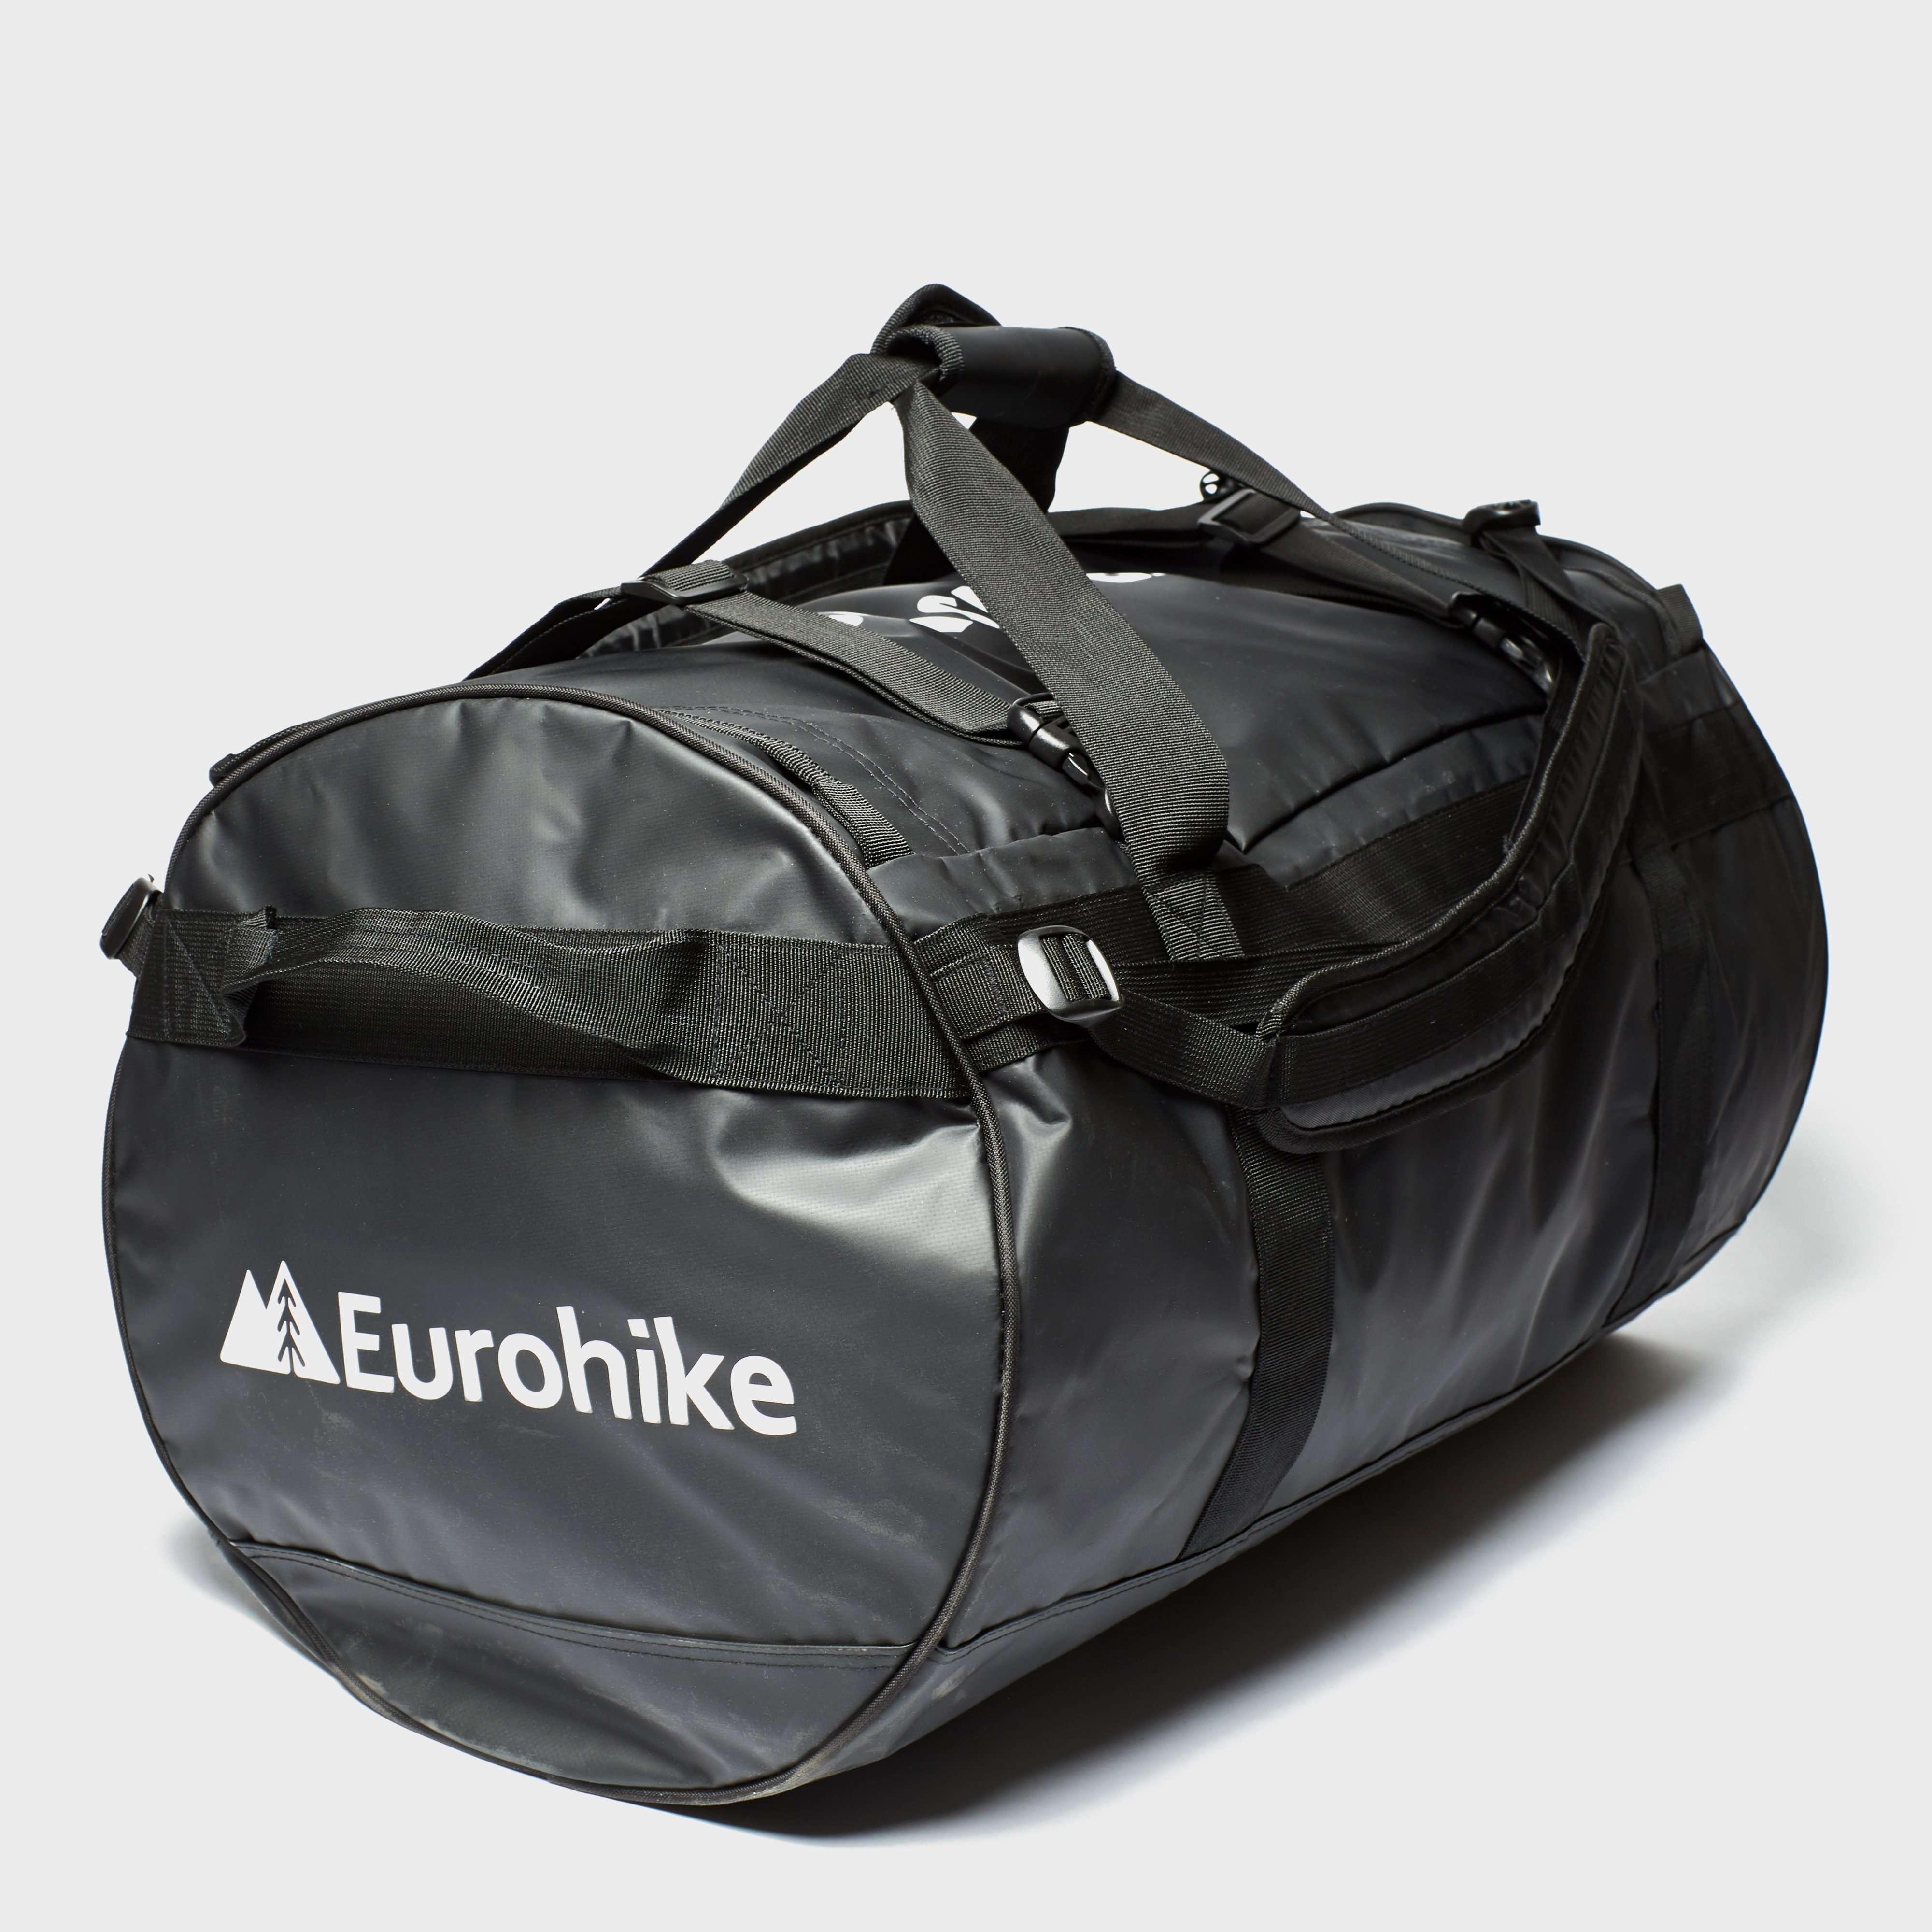 EUROHIKE Transit 90L Cargo Bag